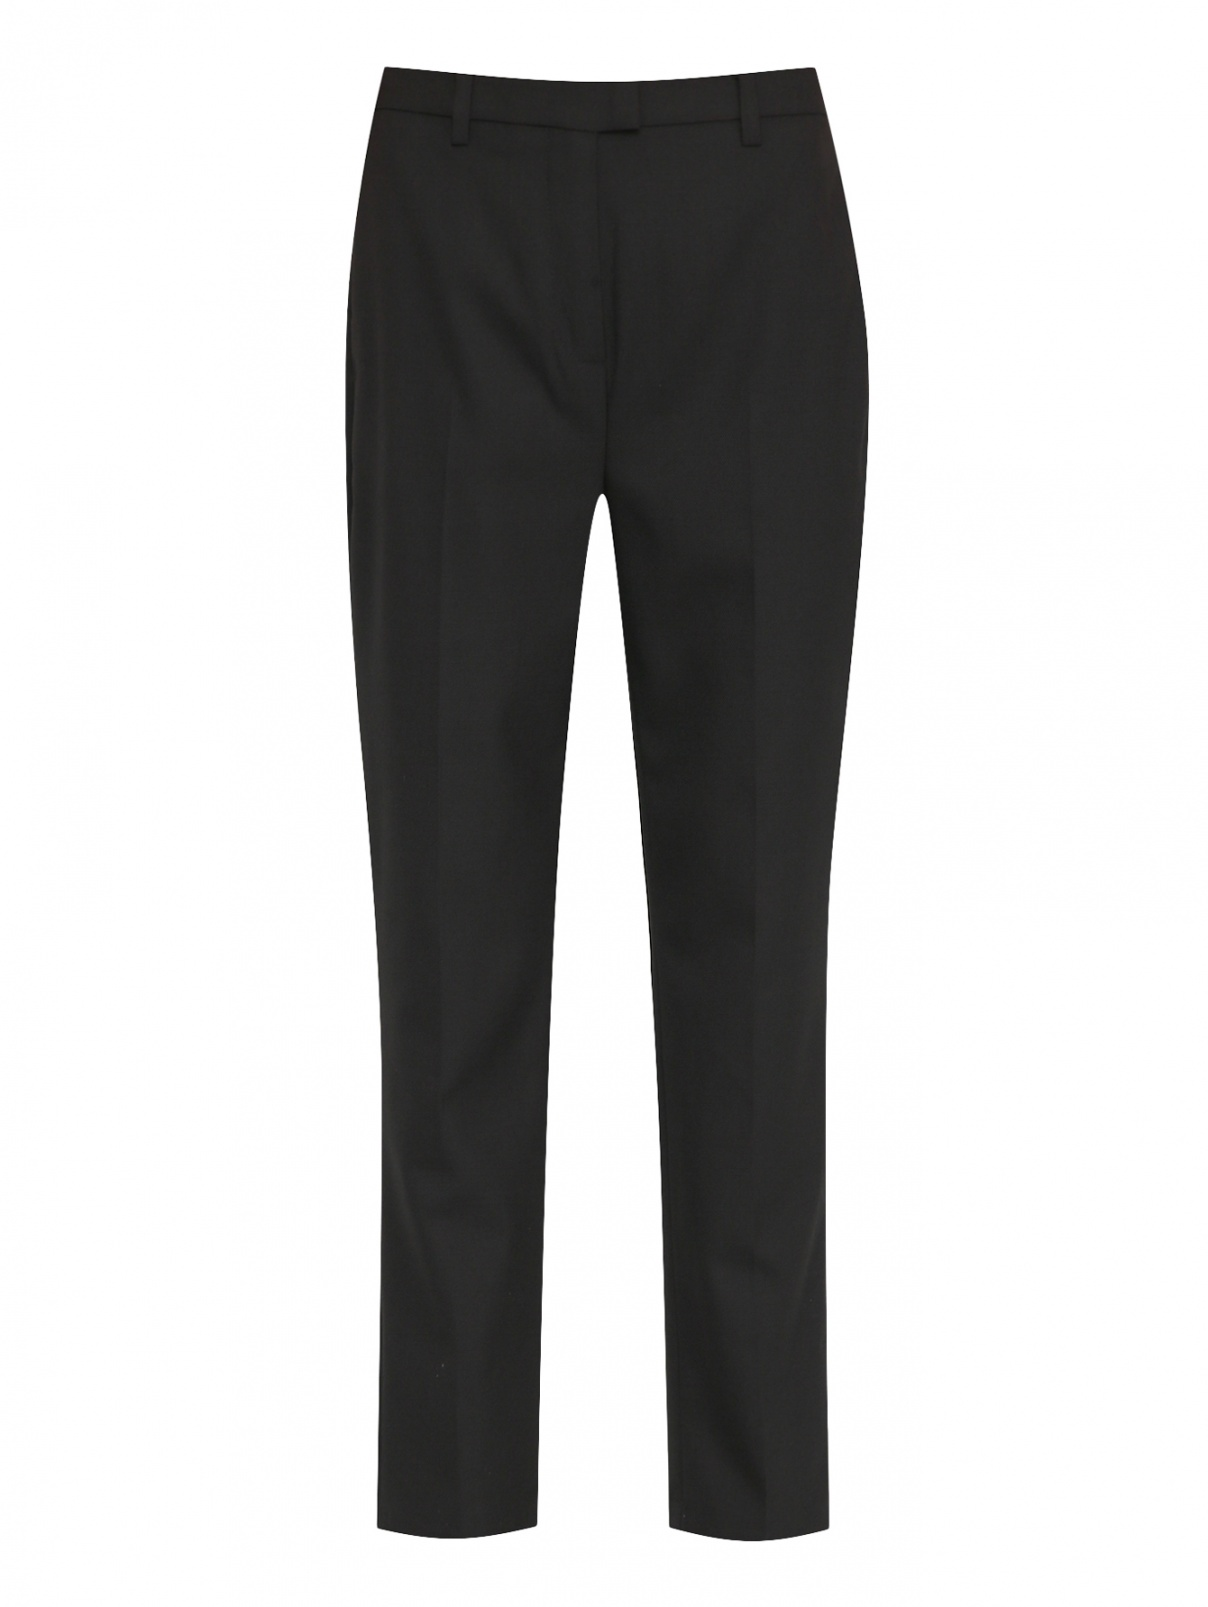 Брюки из смешанной шерсти с карманами Karl Lagerfeld  –  Общий вид